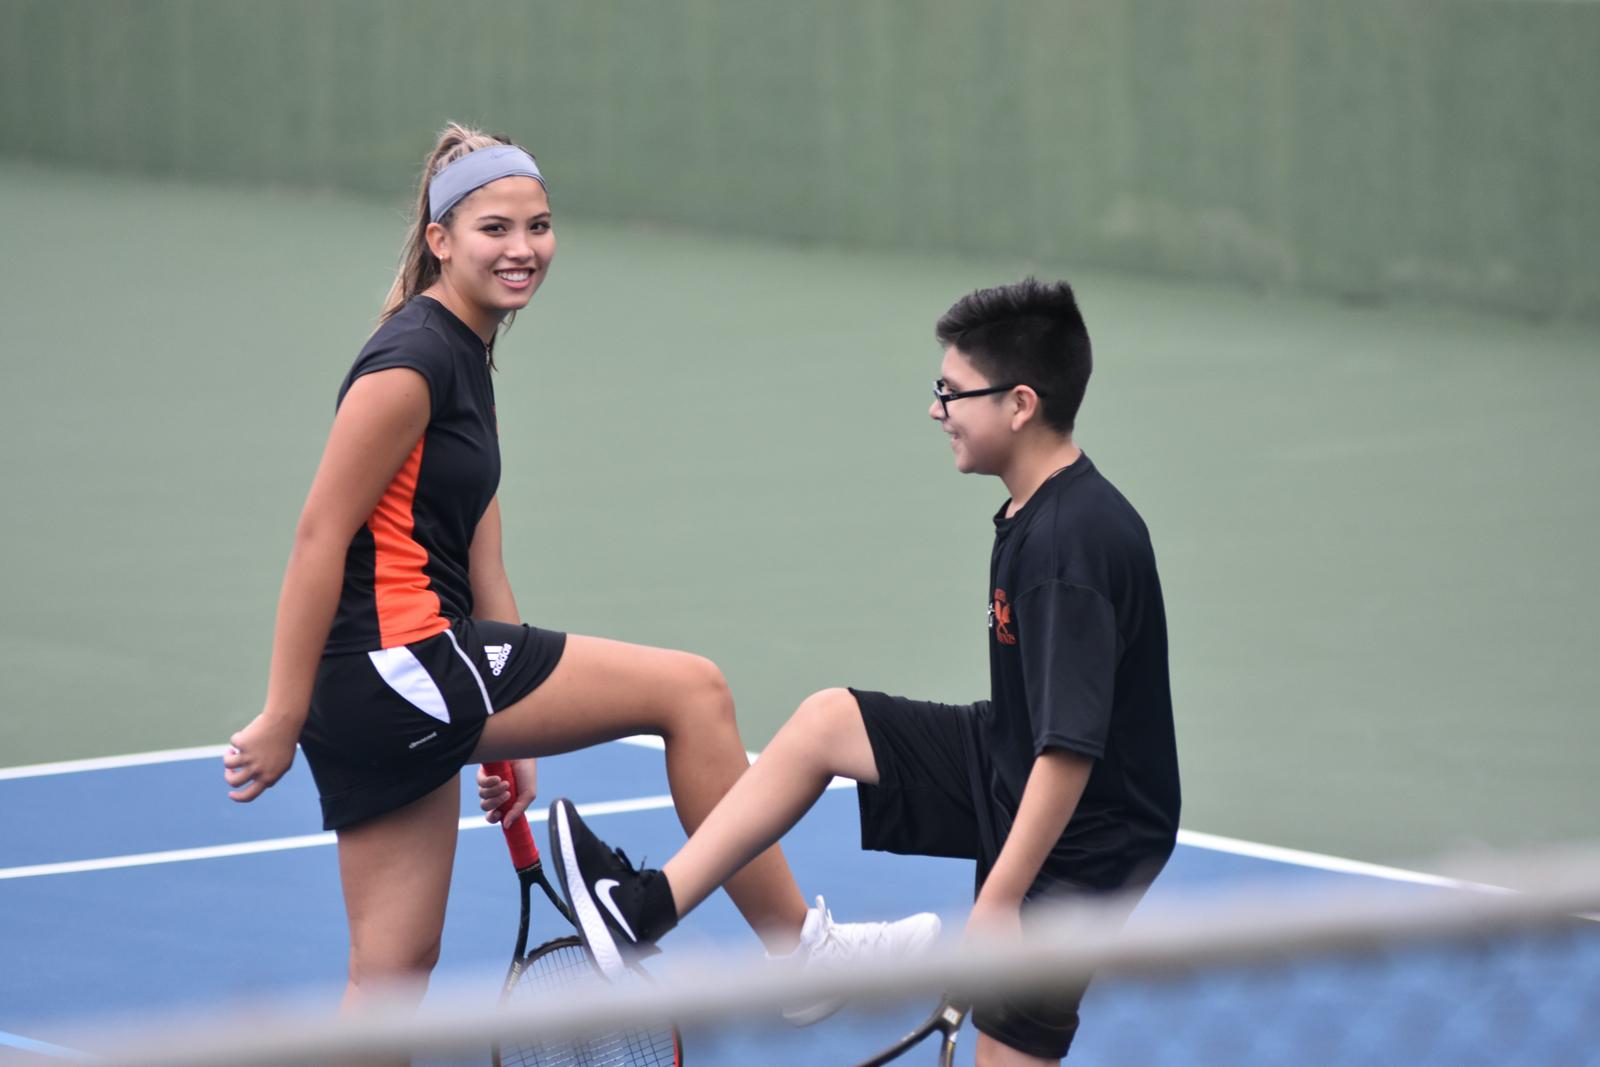 Photo gallery: North Dallas team tennis vs. Roosevelt — Sept. 23, 2020